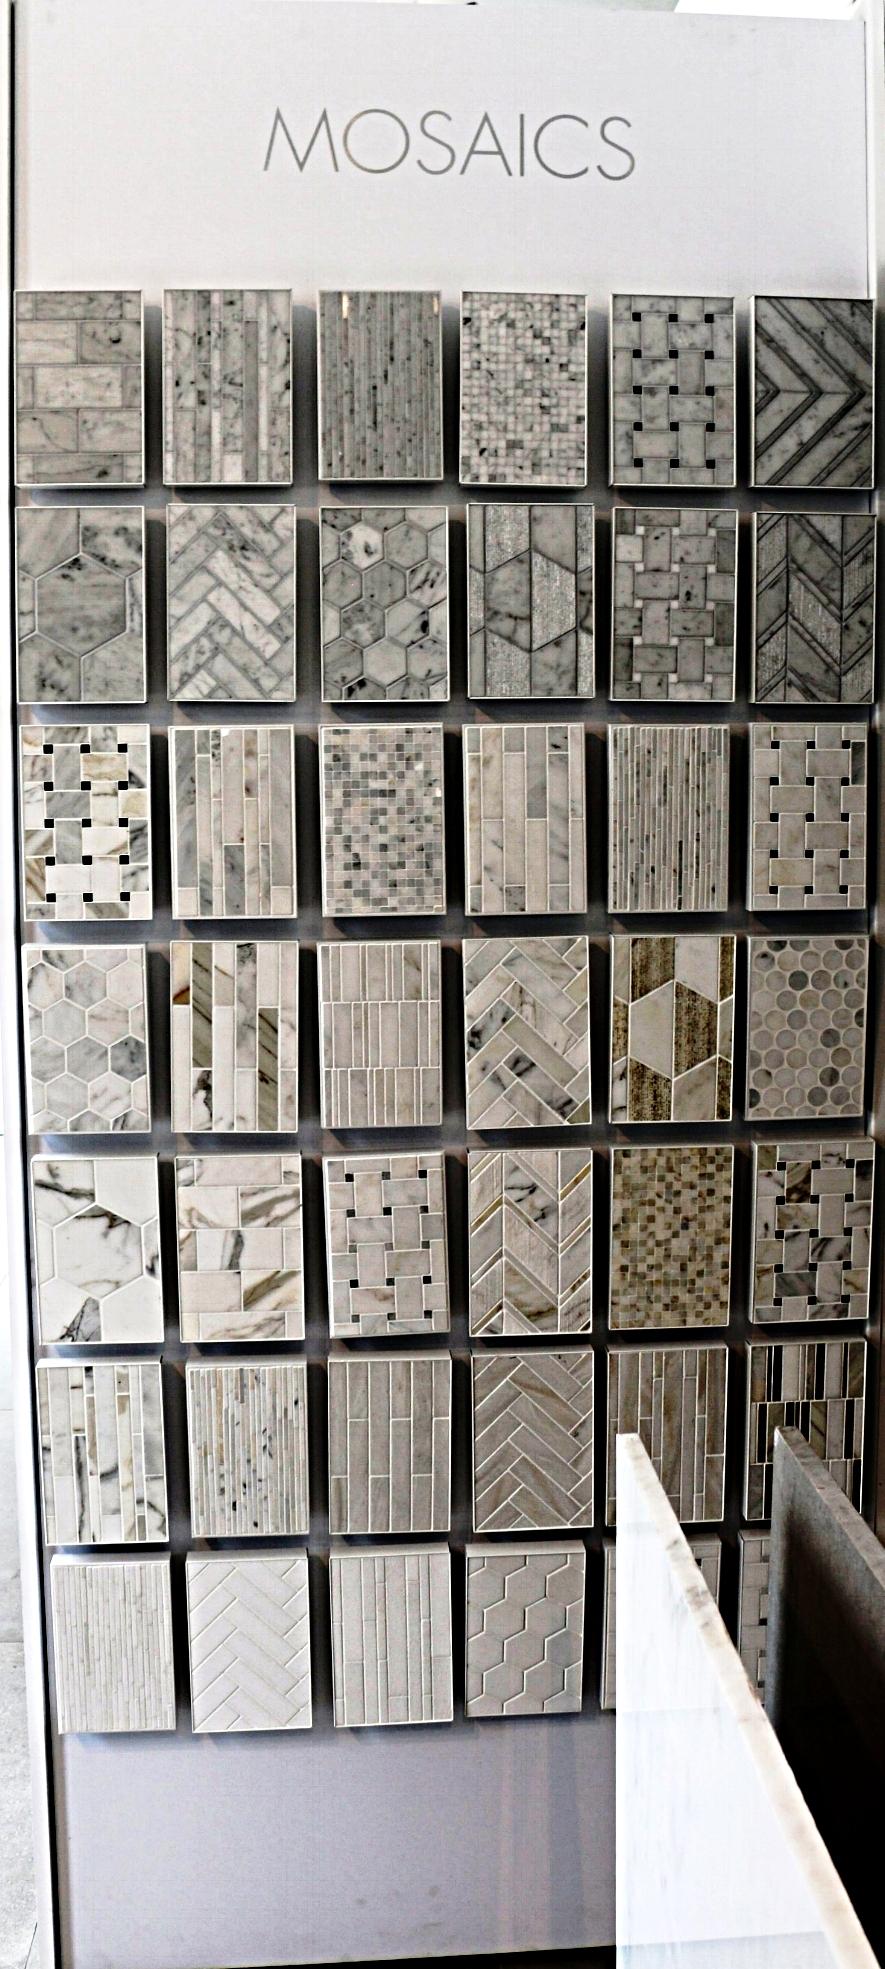 Mosaics wall.jpg